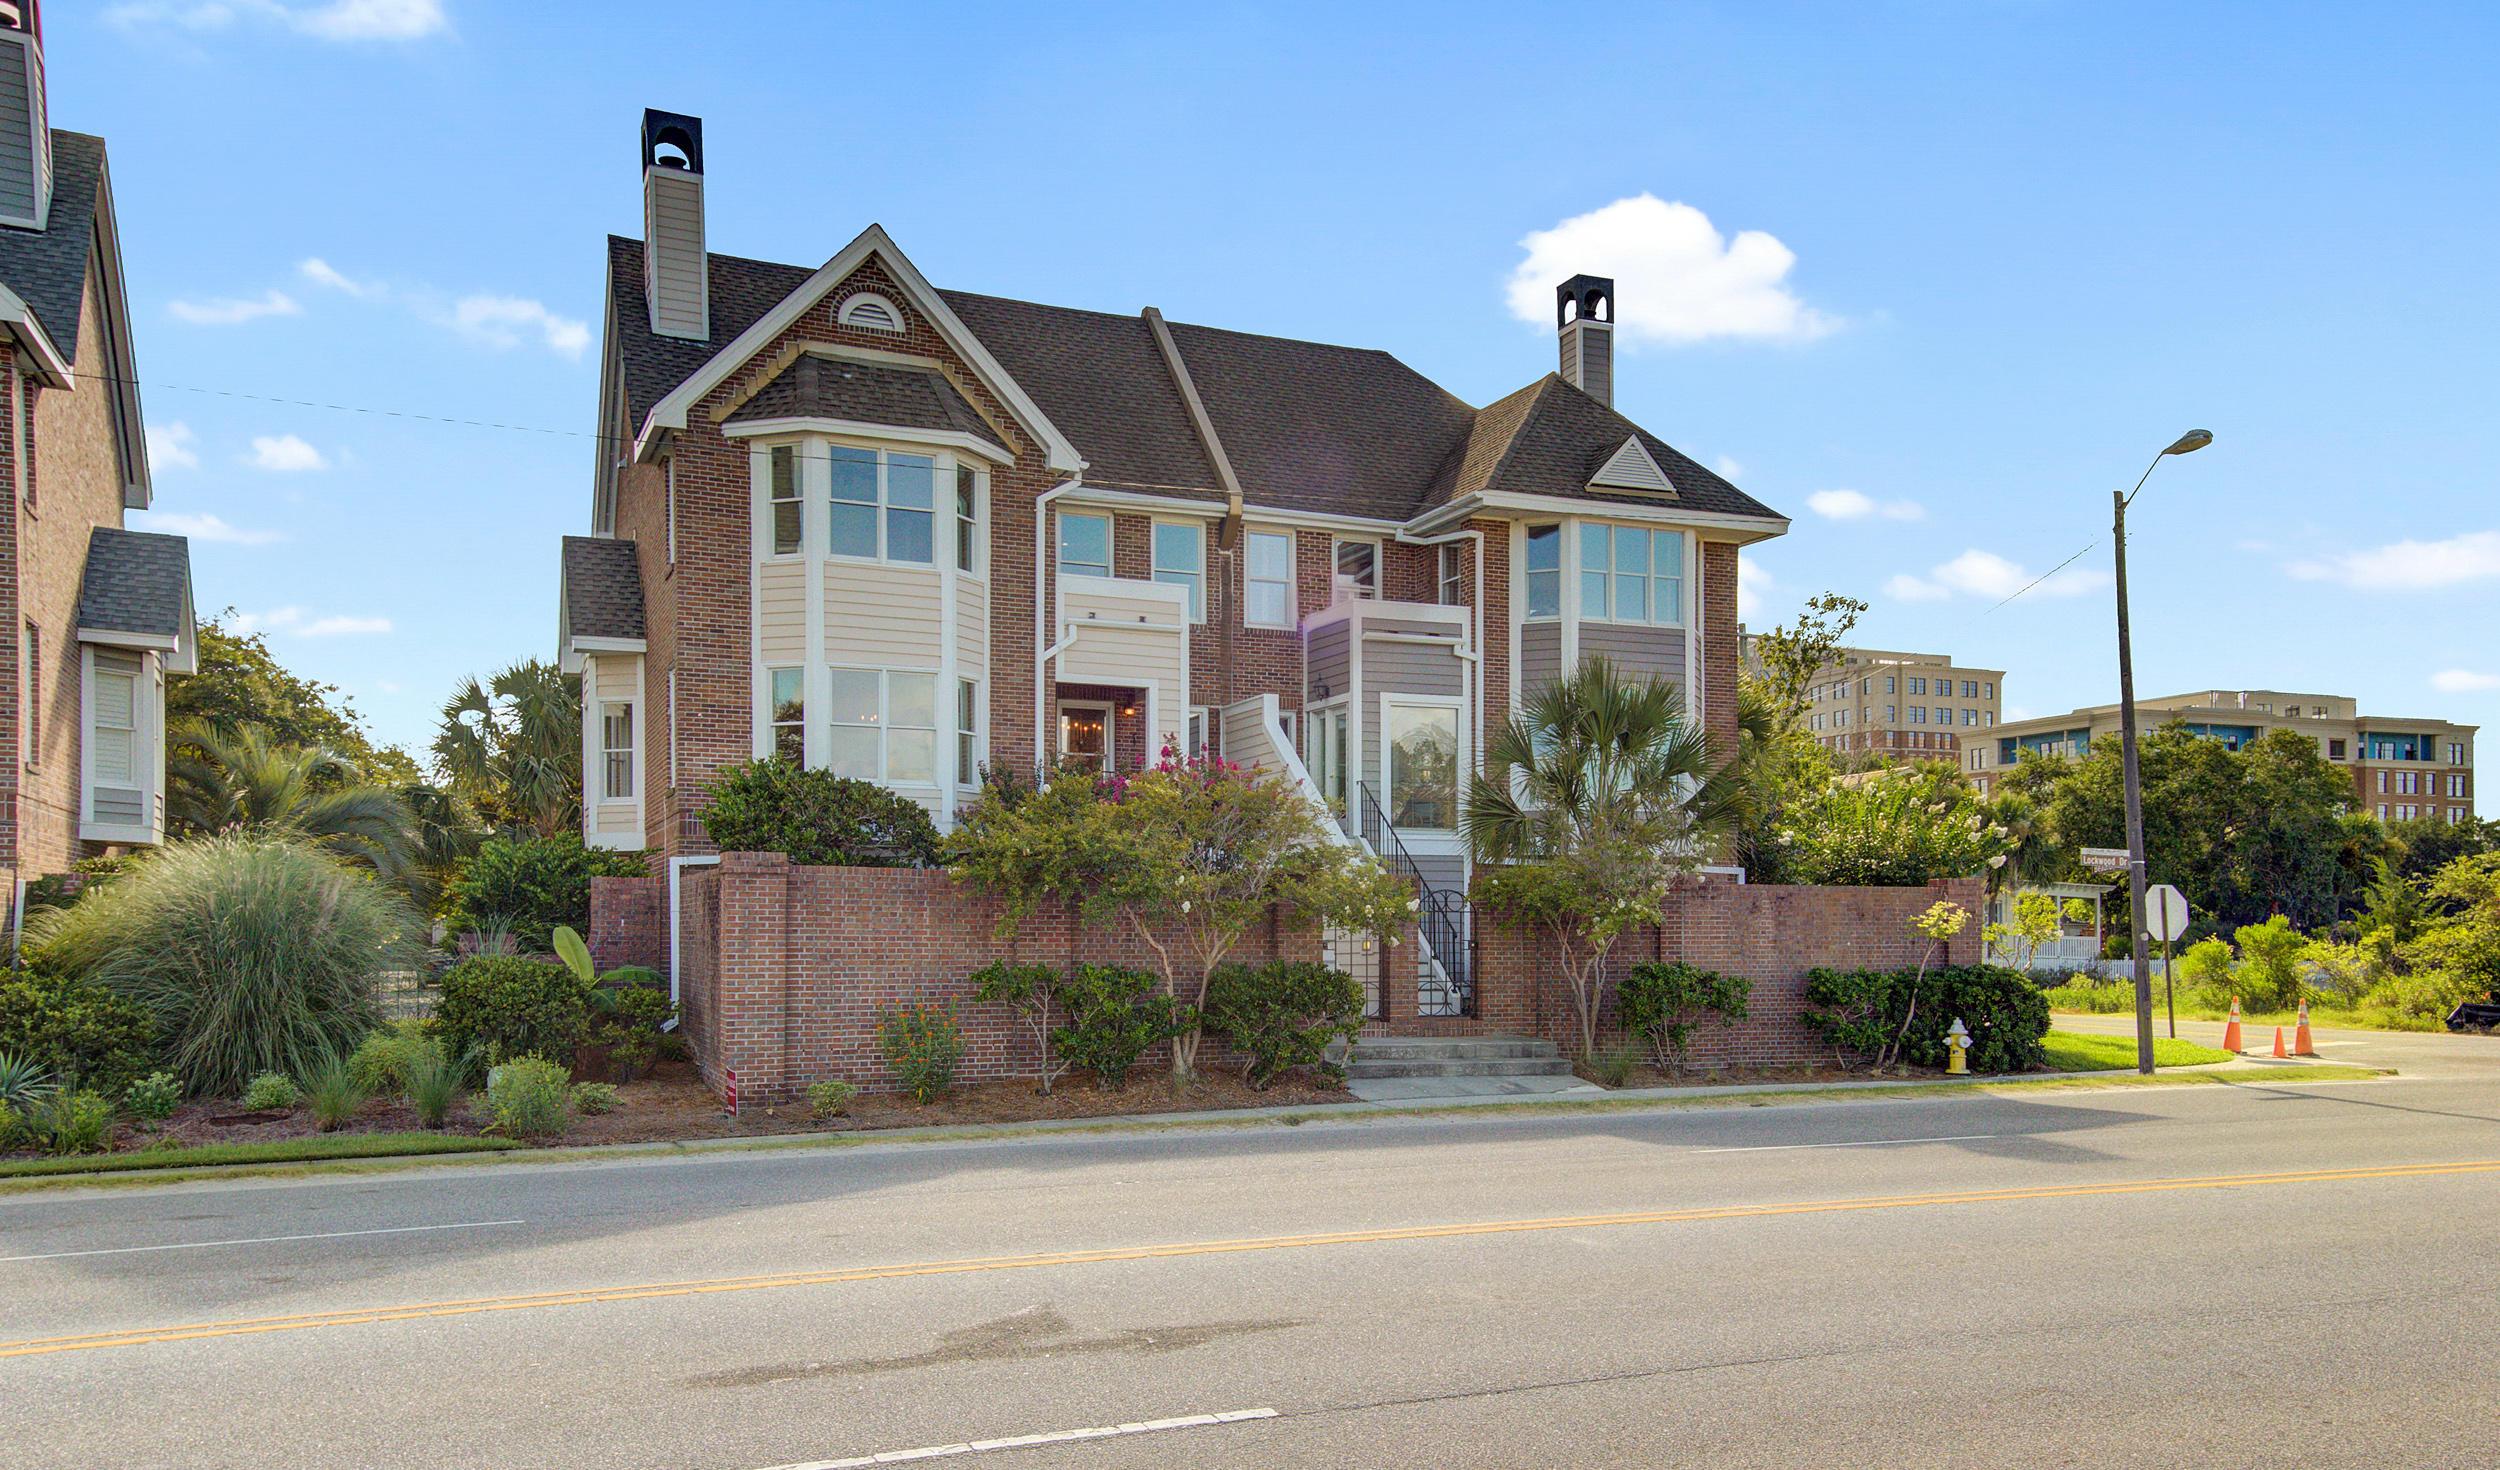 15 Harleston Pl Charleston, SC 29401